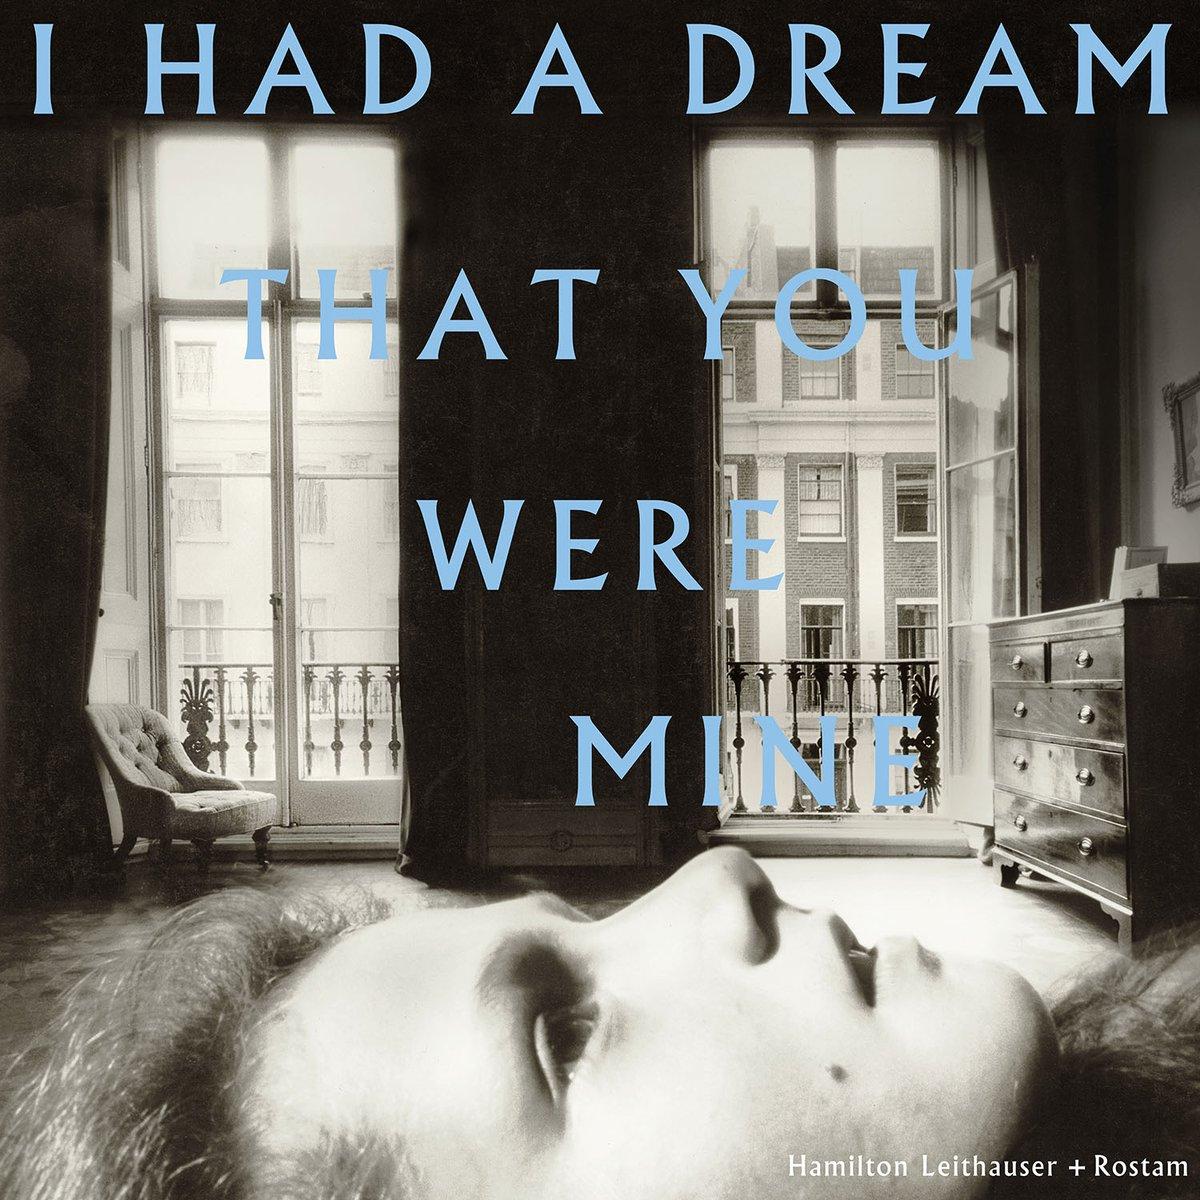 'I Had A Dream That You Were Mine' by Hamilton Leithauser + Rostam